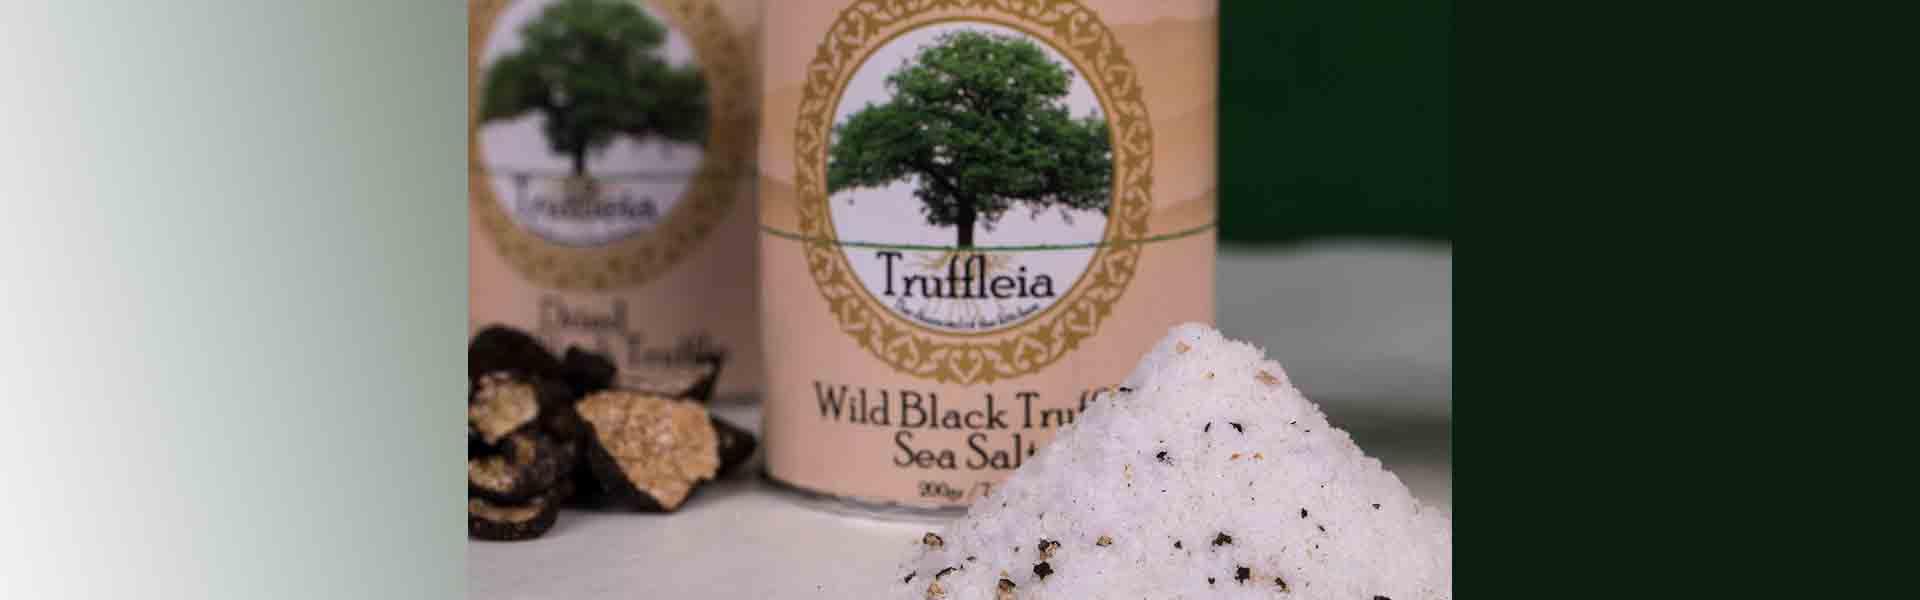 truffle-banner5